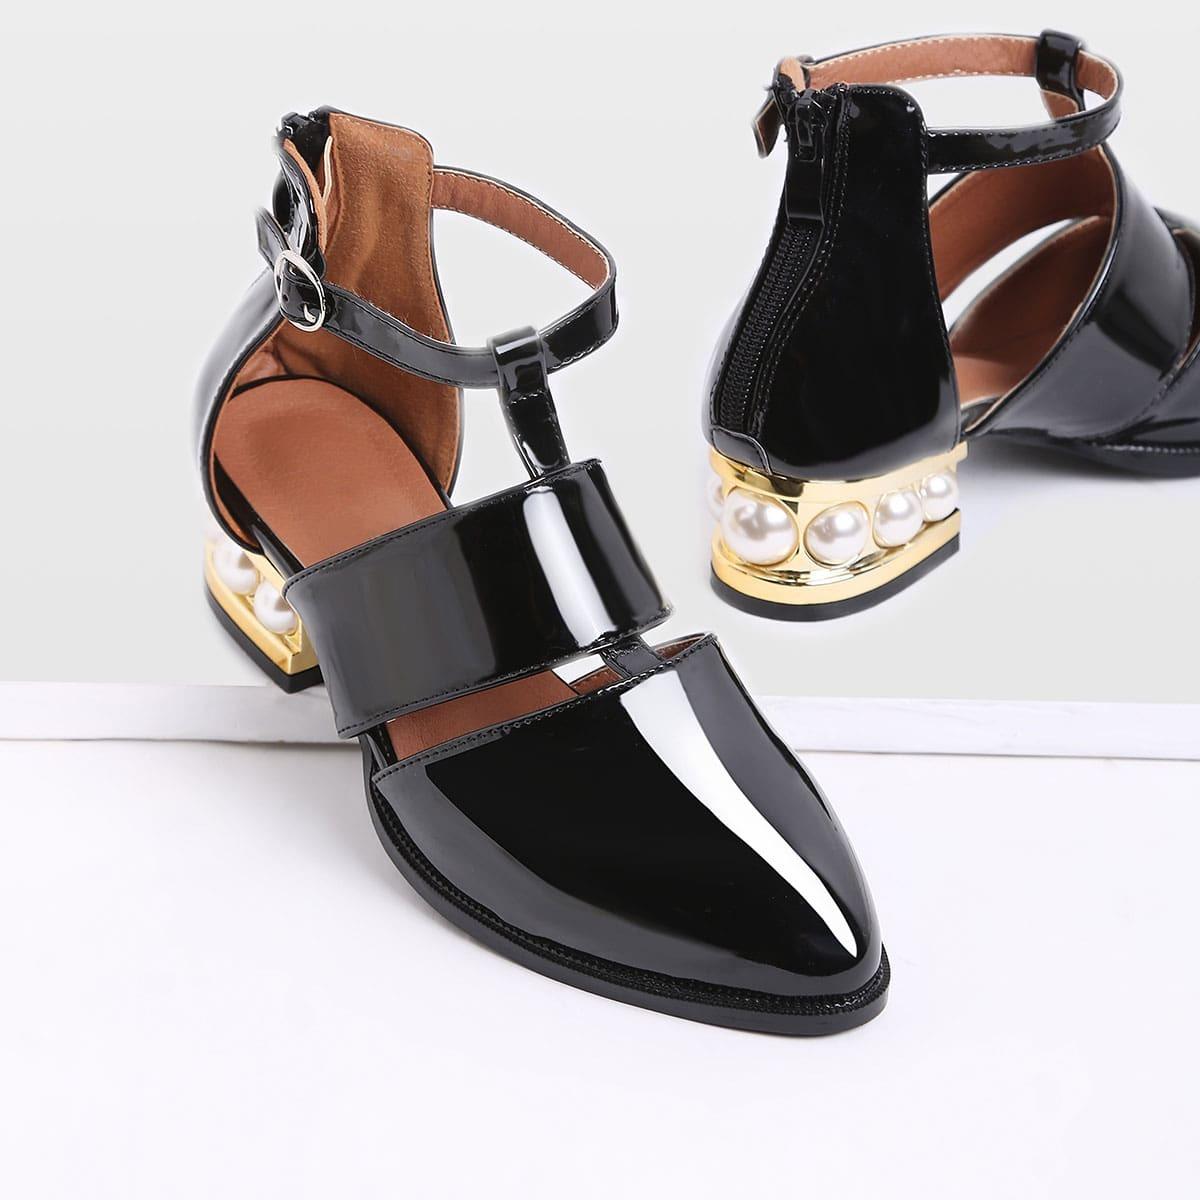 - Black Pearl Design Back Zipper Patent Leather Shoes